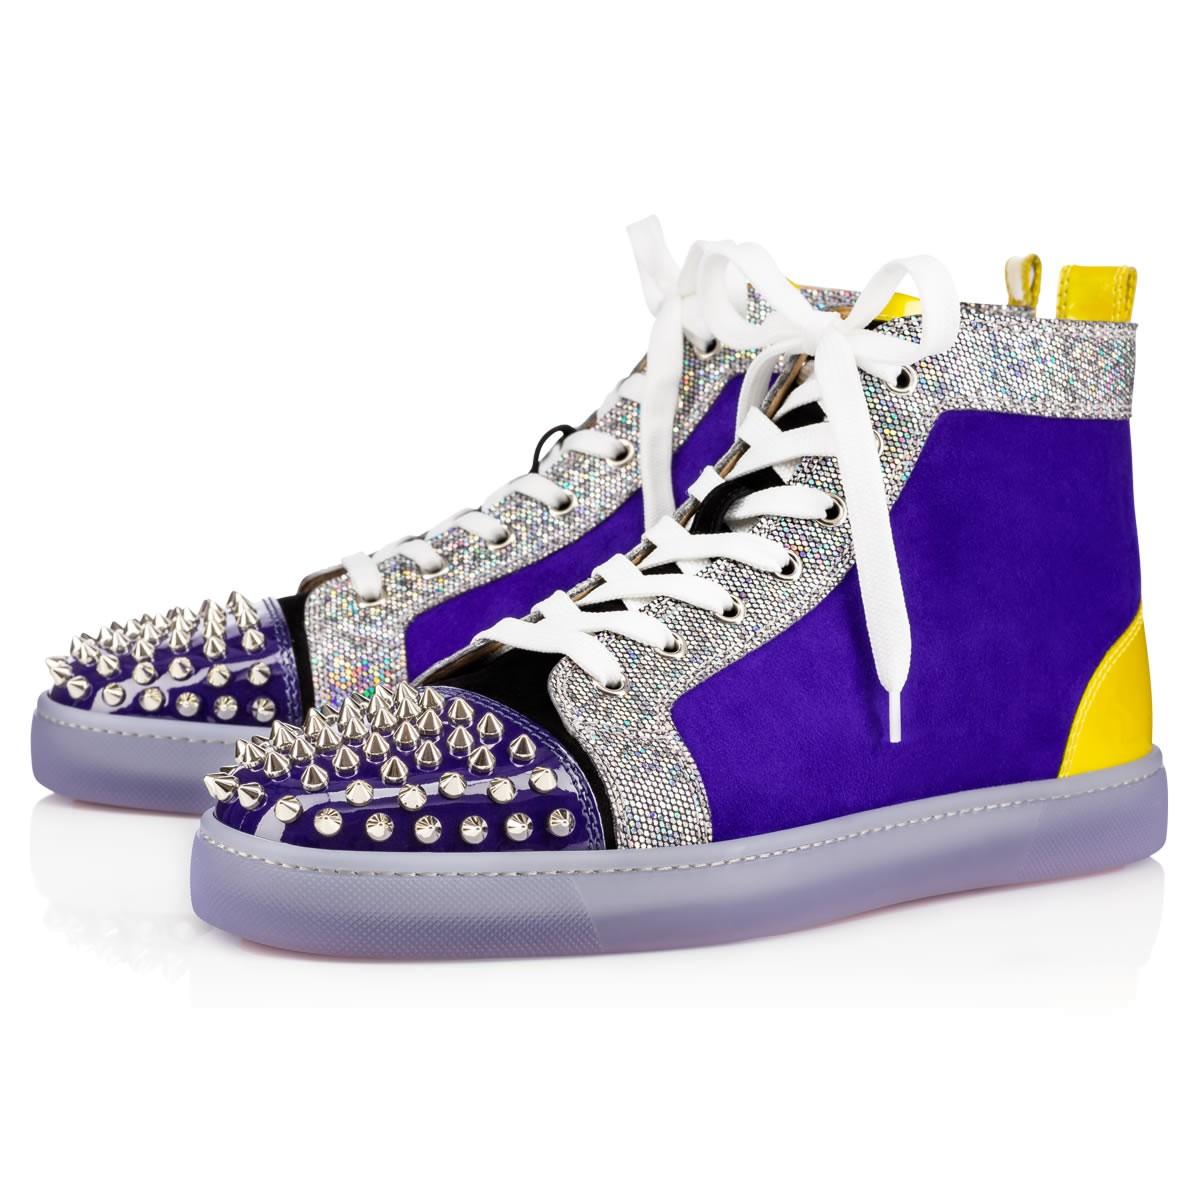 e731a51d43a4 Christian Louboutin Lou Spikes Glitter Disco Ball Multicolor Glitter Canvas  - Men Shoes -